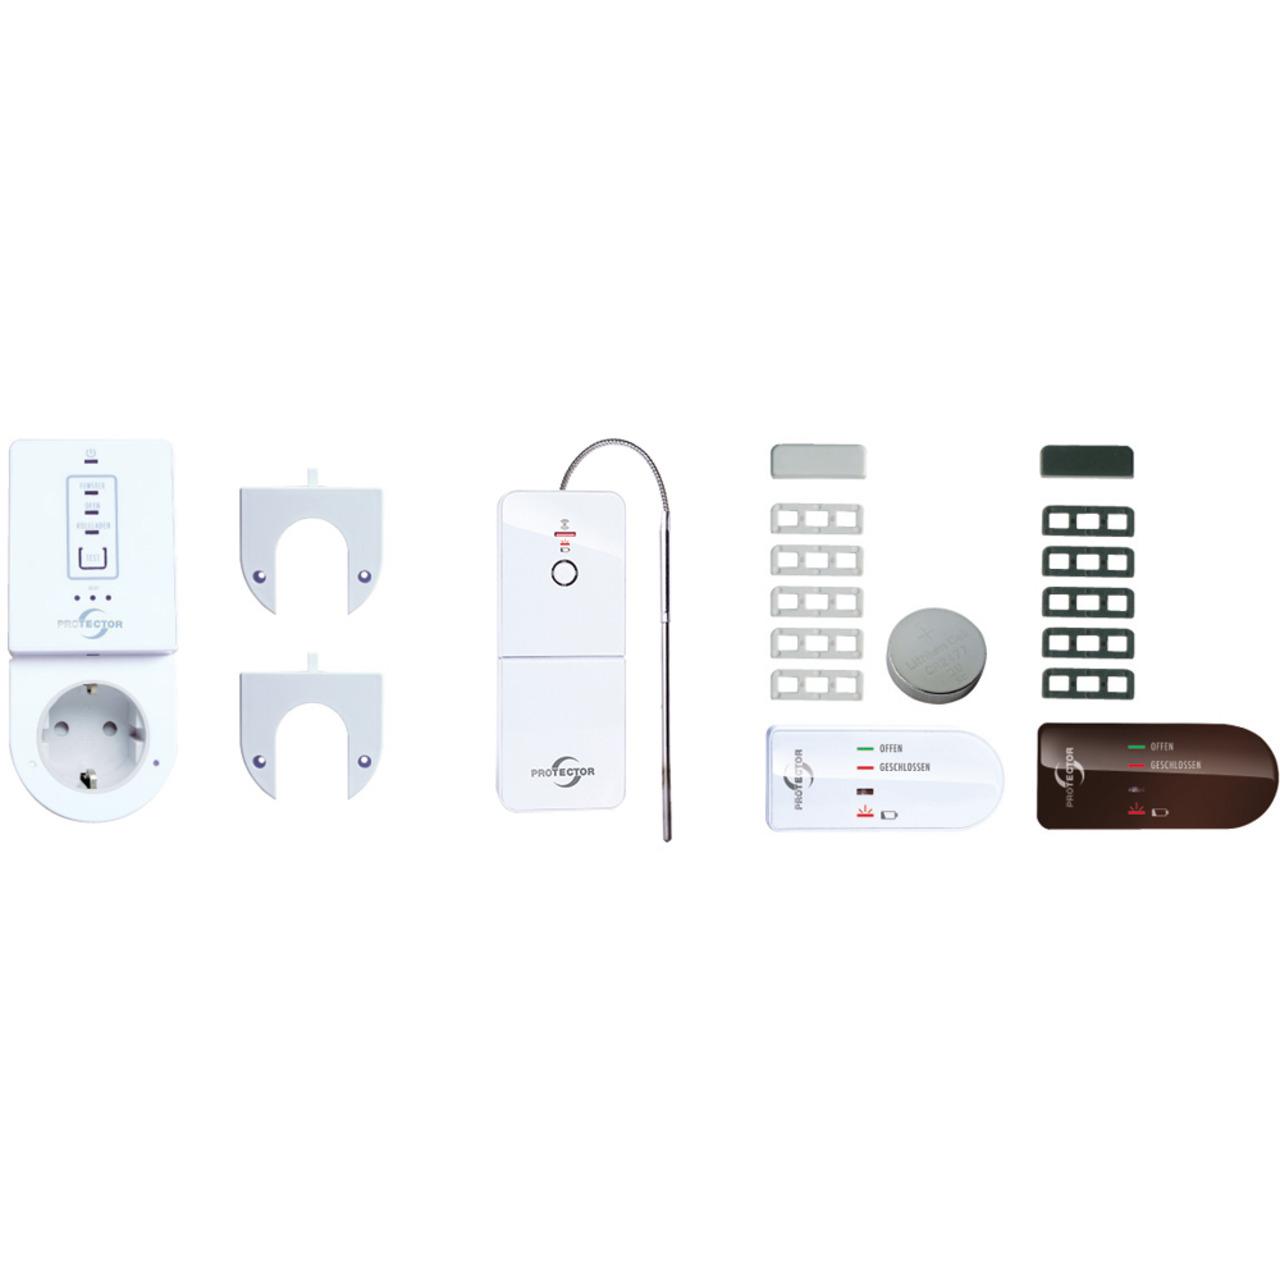 PROTECTOR AS-7030 Funk-Abluftsteuerung THERMO mit Fensterkontakt und Thermosensor